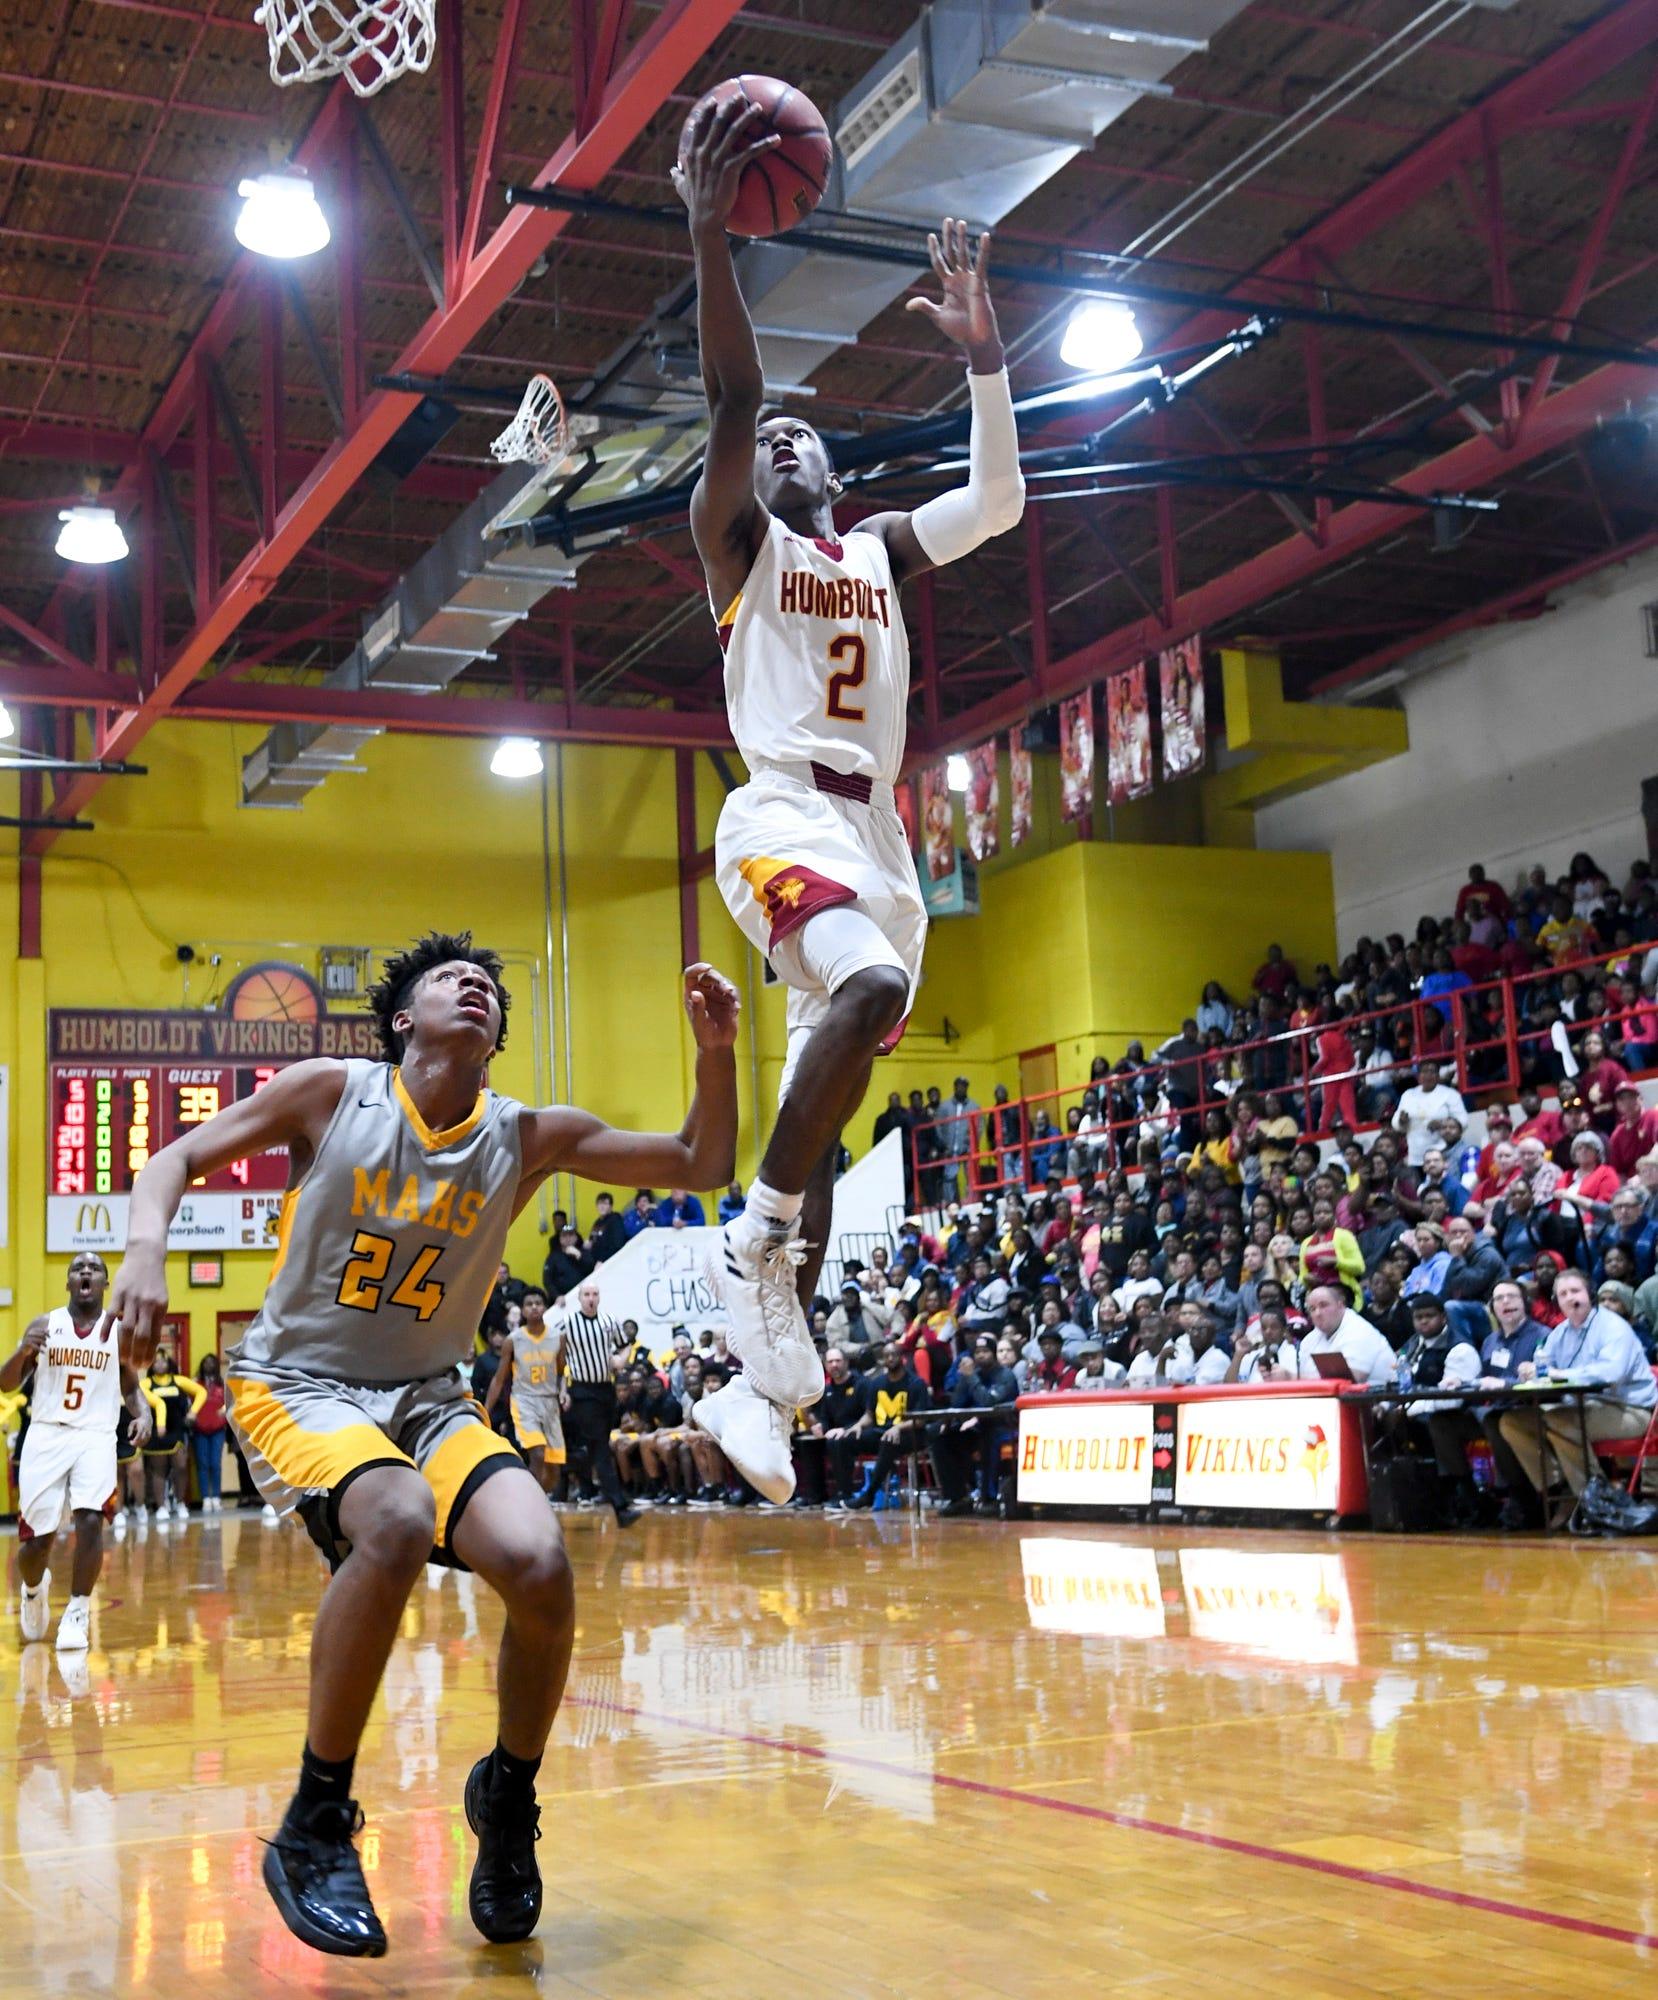 Tssaa State Tournament Humboldt Eyes Redemption In Murfreesboro